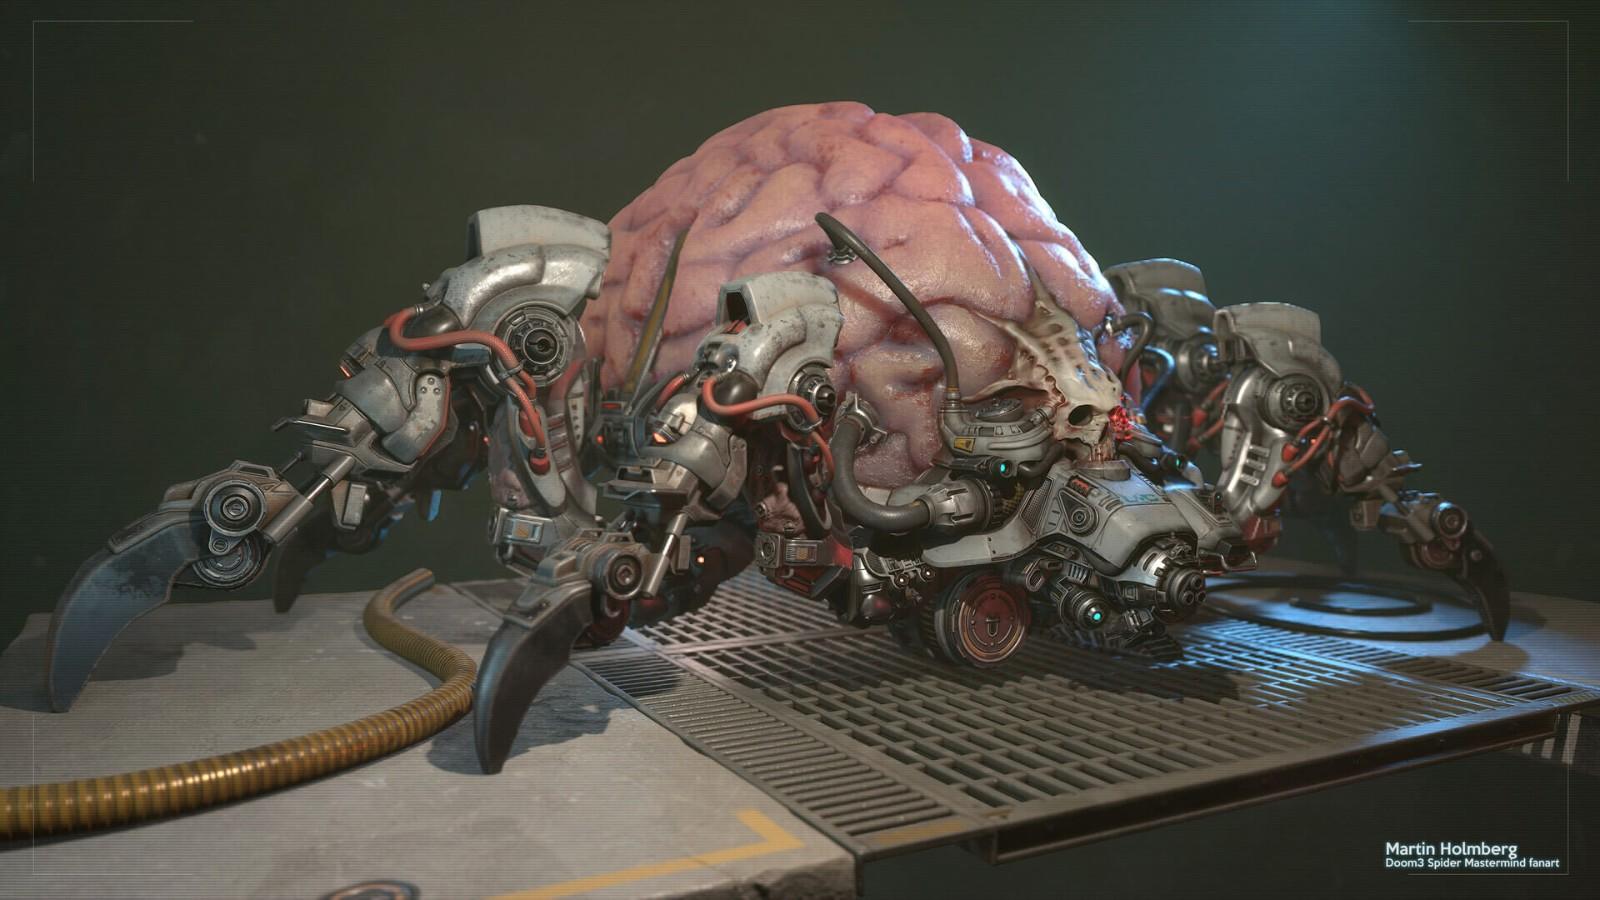 Epic资深场景画师重制《毁灭战士》惊悚蜘蛛首脑插图7